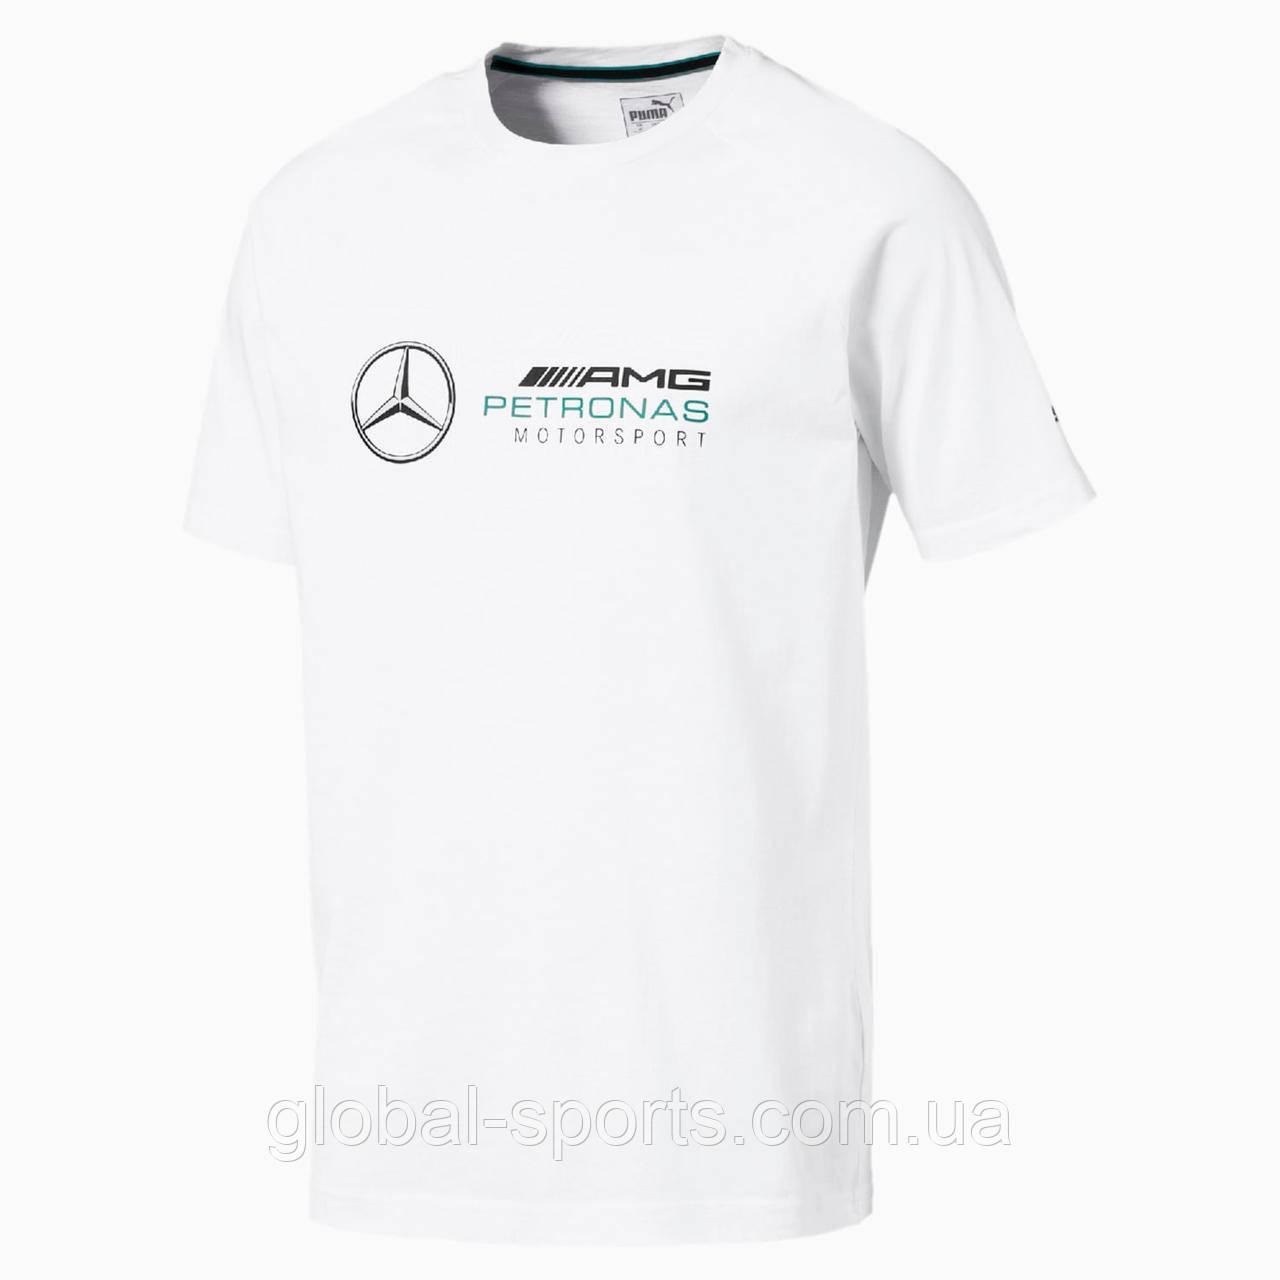 Мужская футболка PUMA MERCEDES AMG PETRONAS (Артикул: 57740905)